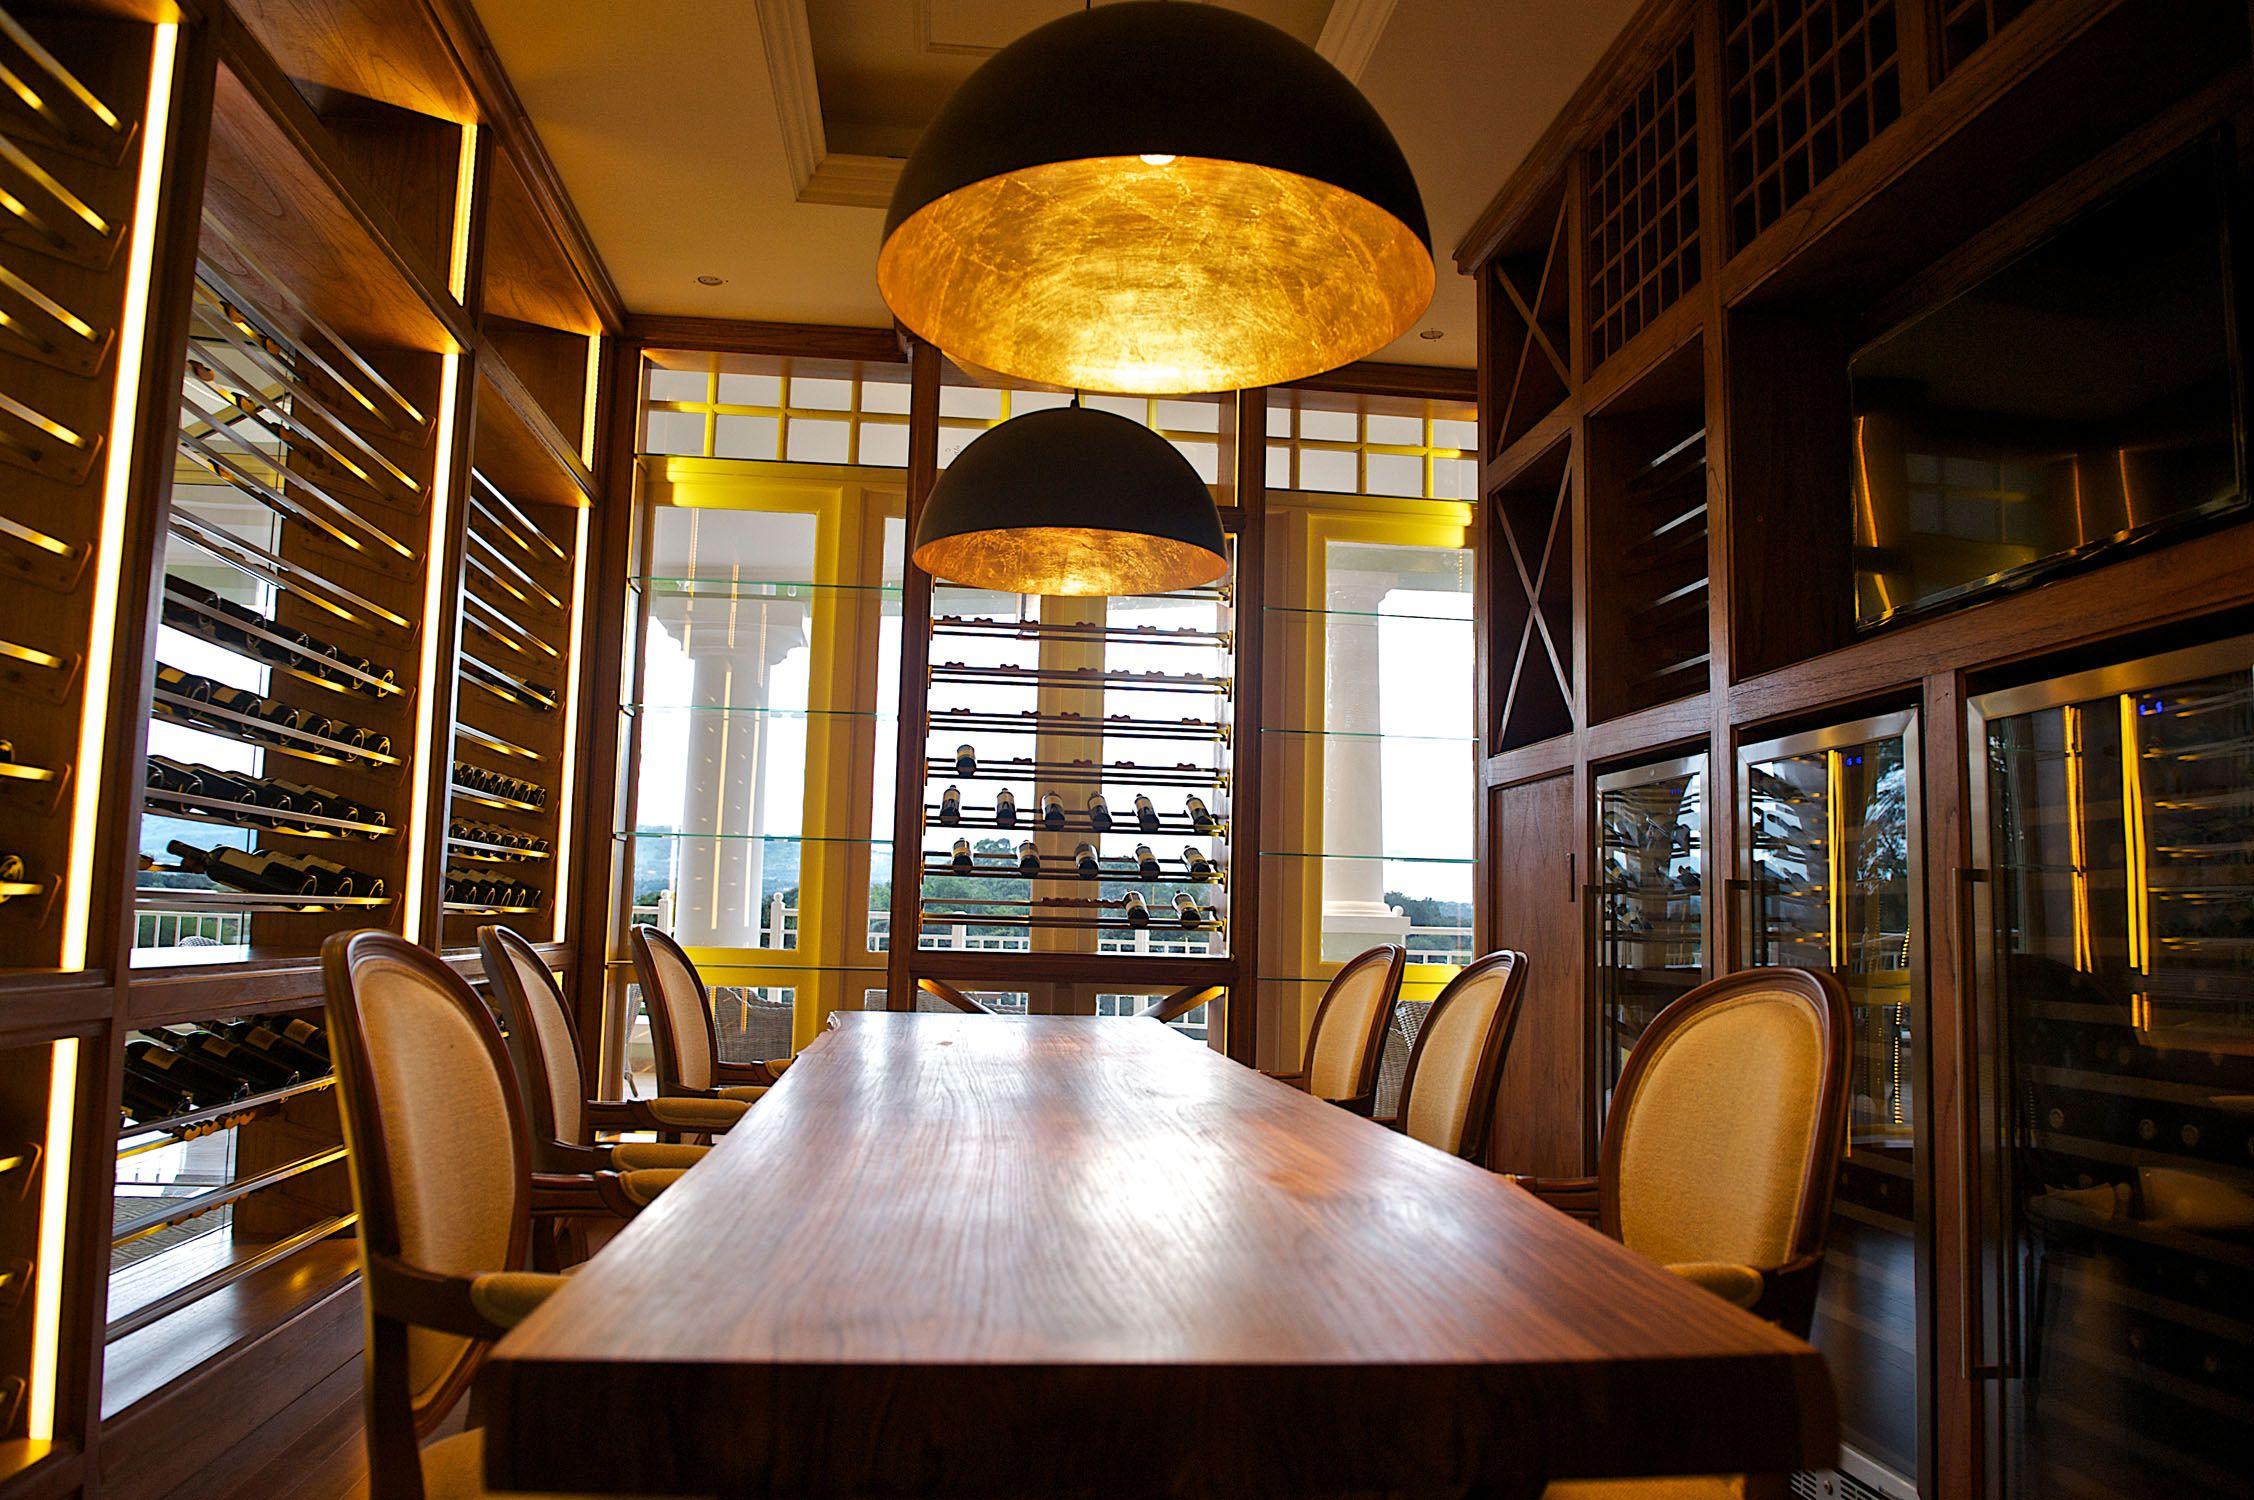 Leather Suppliers Kenya Mail: Hemingways Nairobi Hotel (Kenya). [Room Casegoods